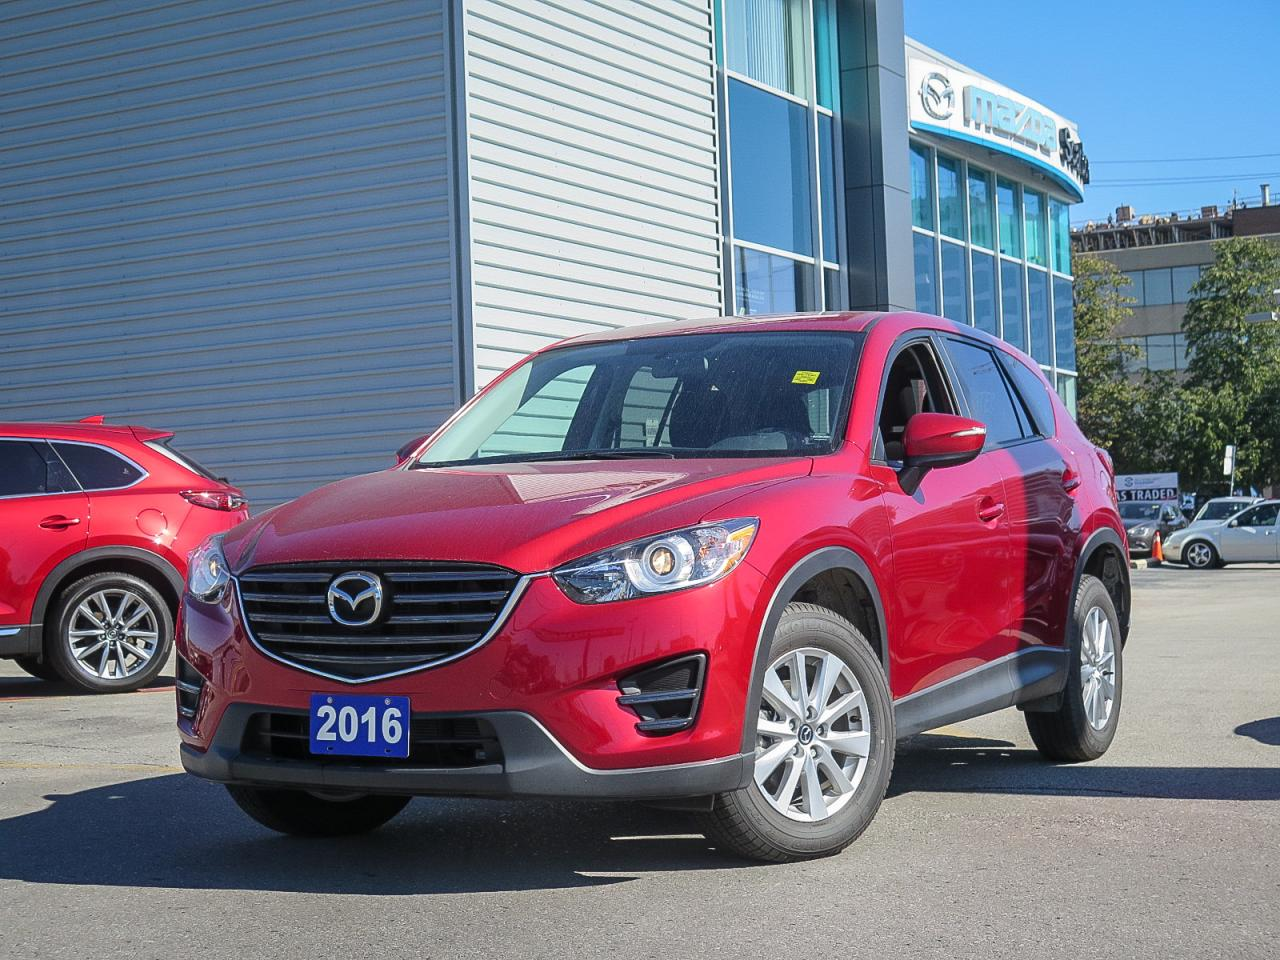 2016 Mazda CX-5 FINANCE @0.9%